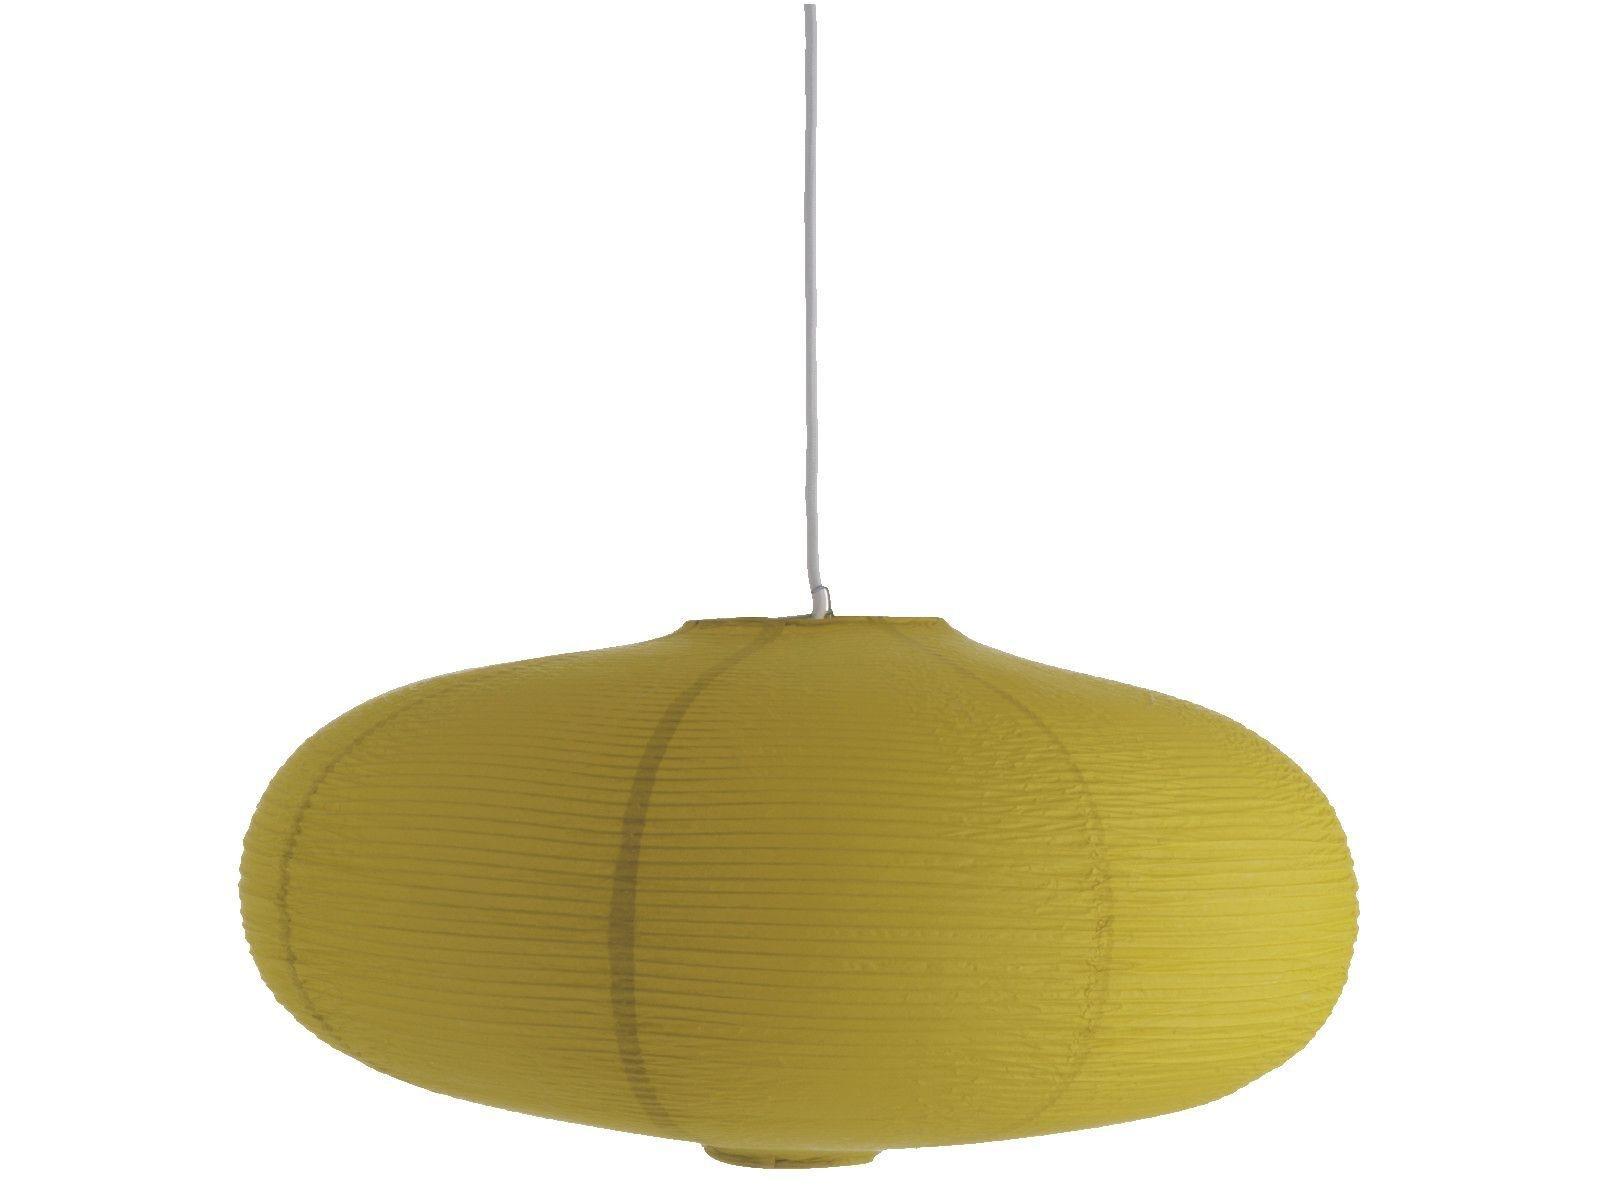 habitat-shiro-saffron-yellow-paper-pendant-shade